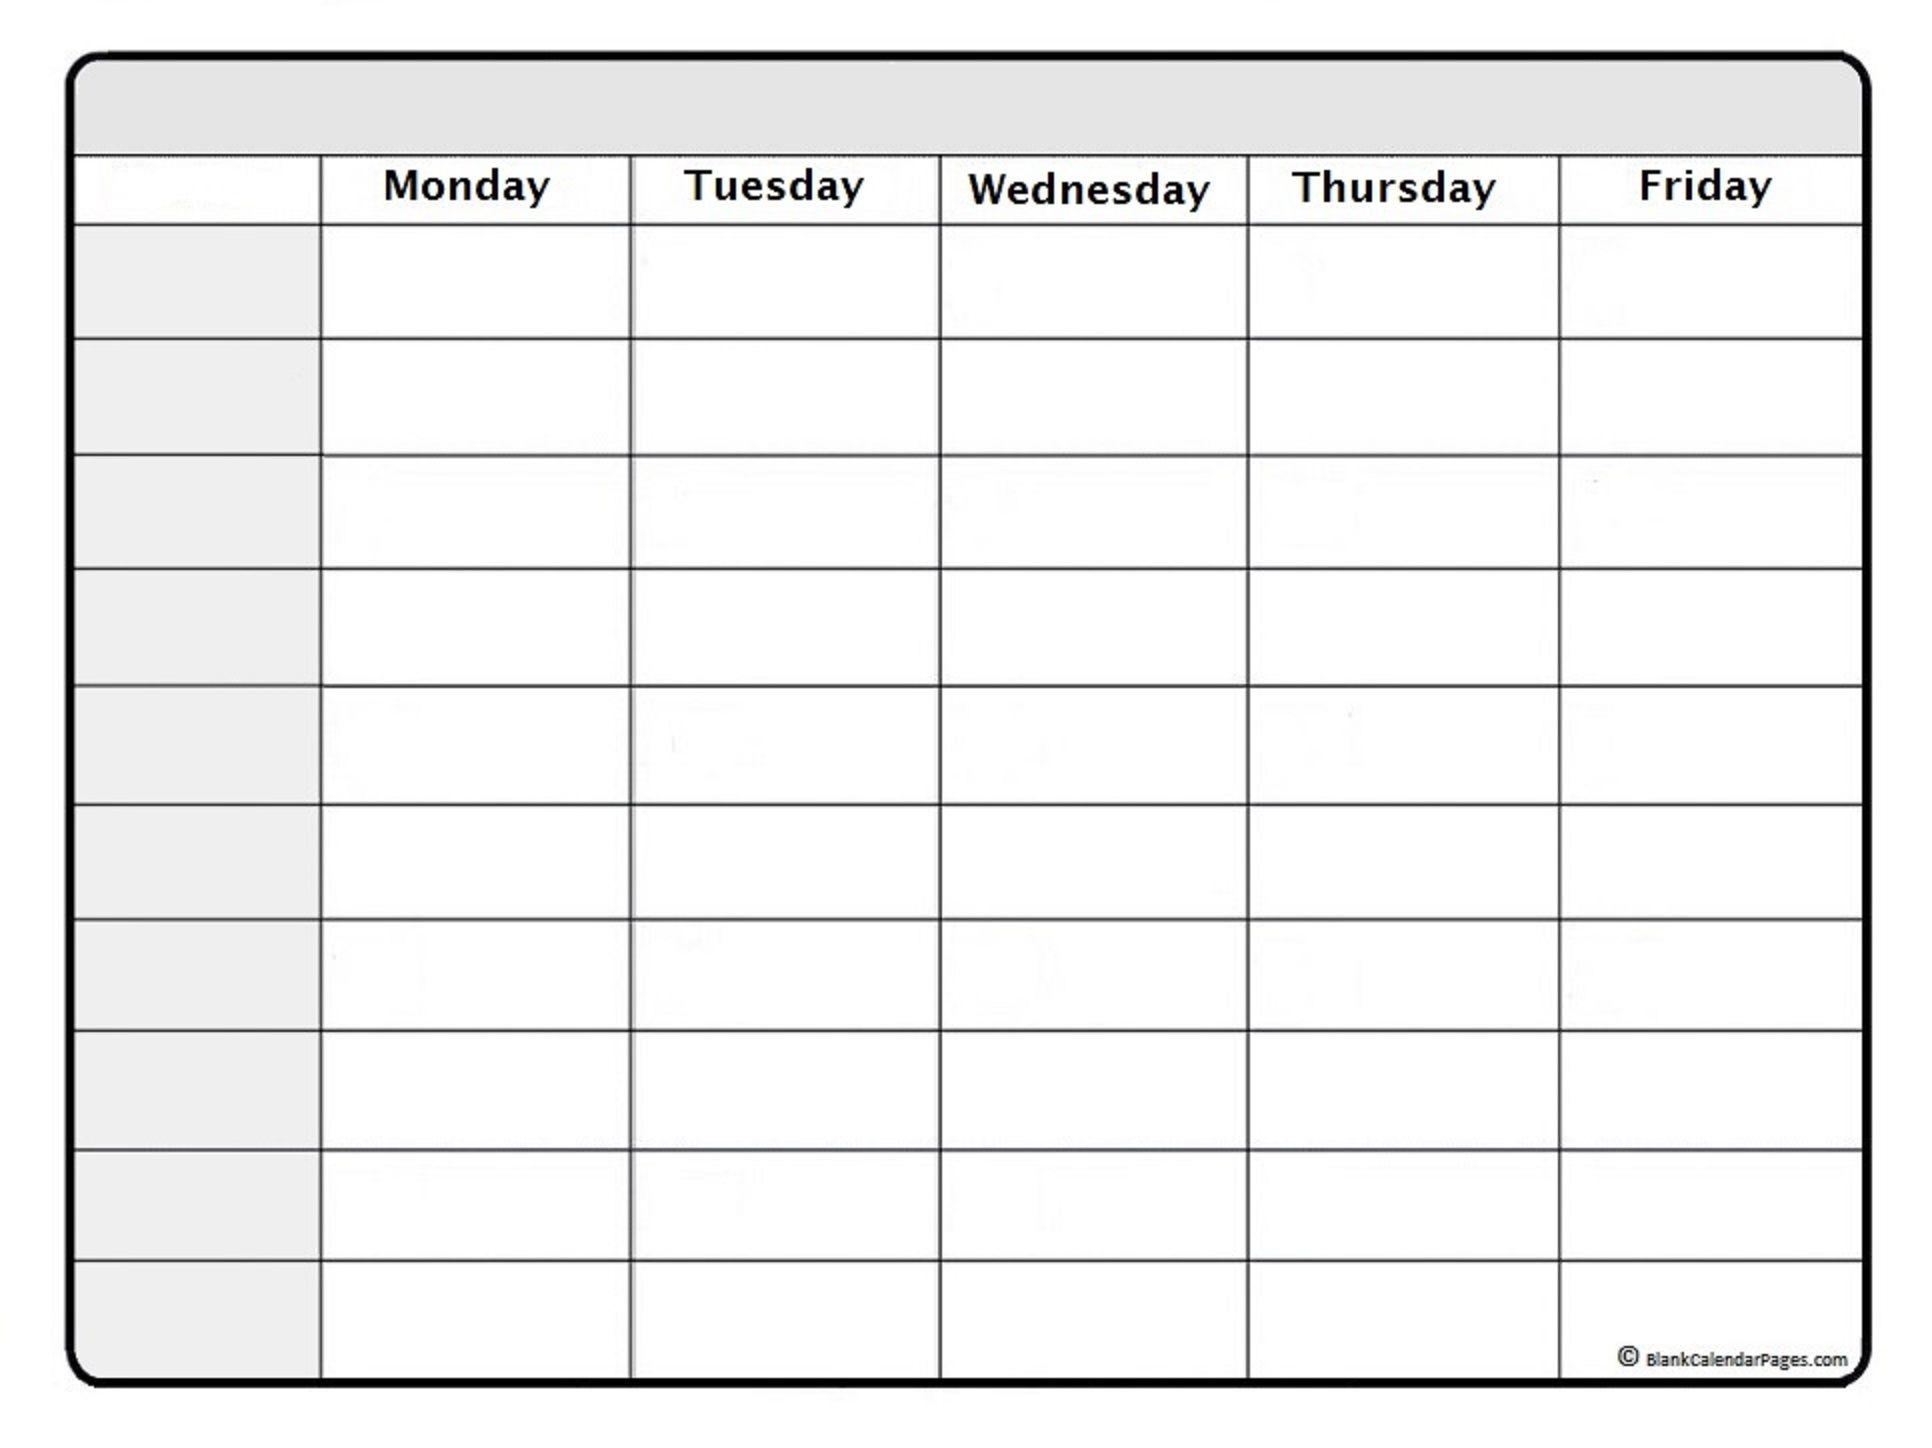 October 2020 Weekly Calendar | October 2020 Weekly Calendar